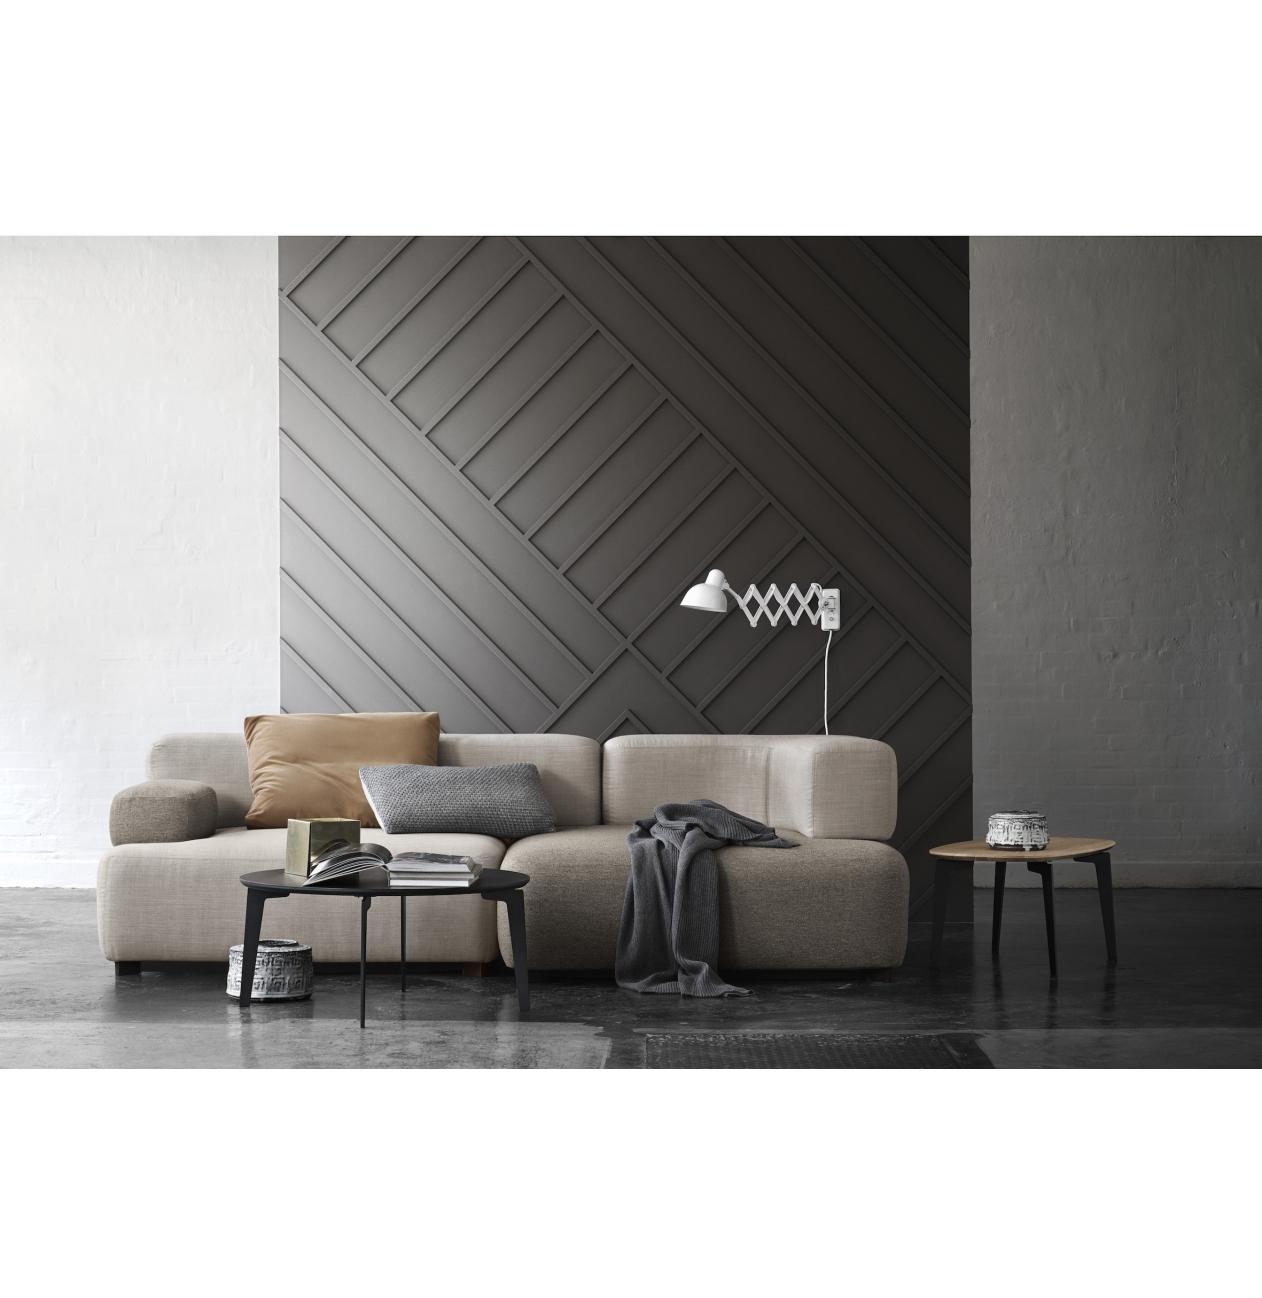 lightyears wandlamp kaiser idell 6718 w versteeg lichtstudio. Black Bedroom Furniture Sets. Home Design Ideas